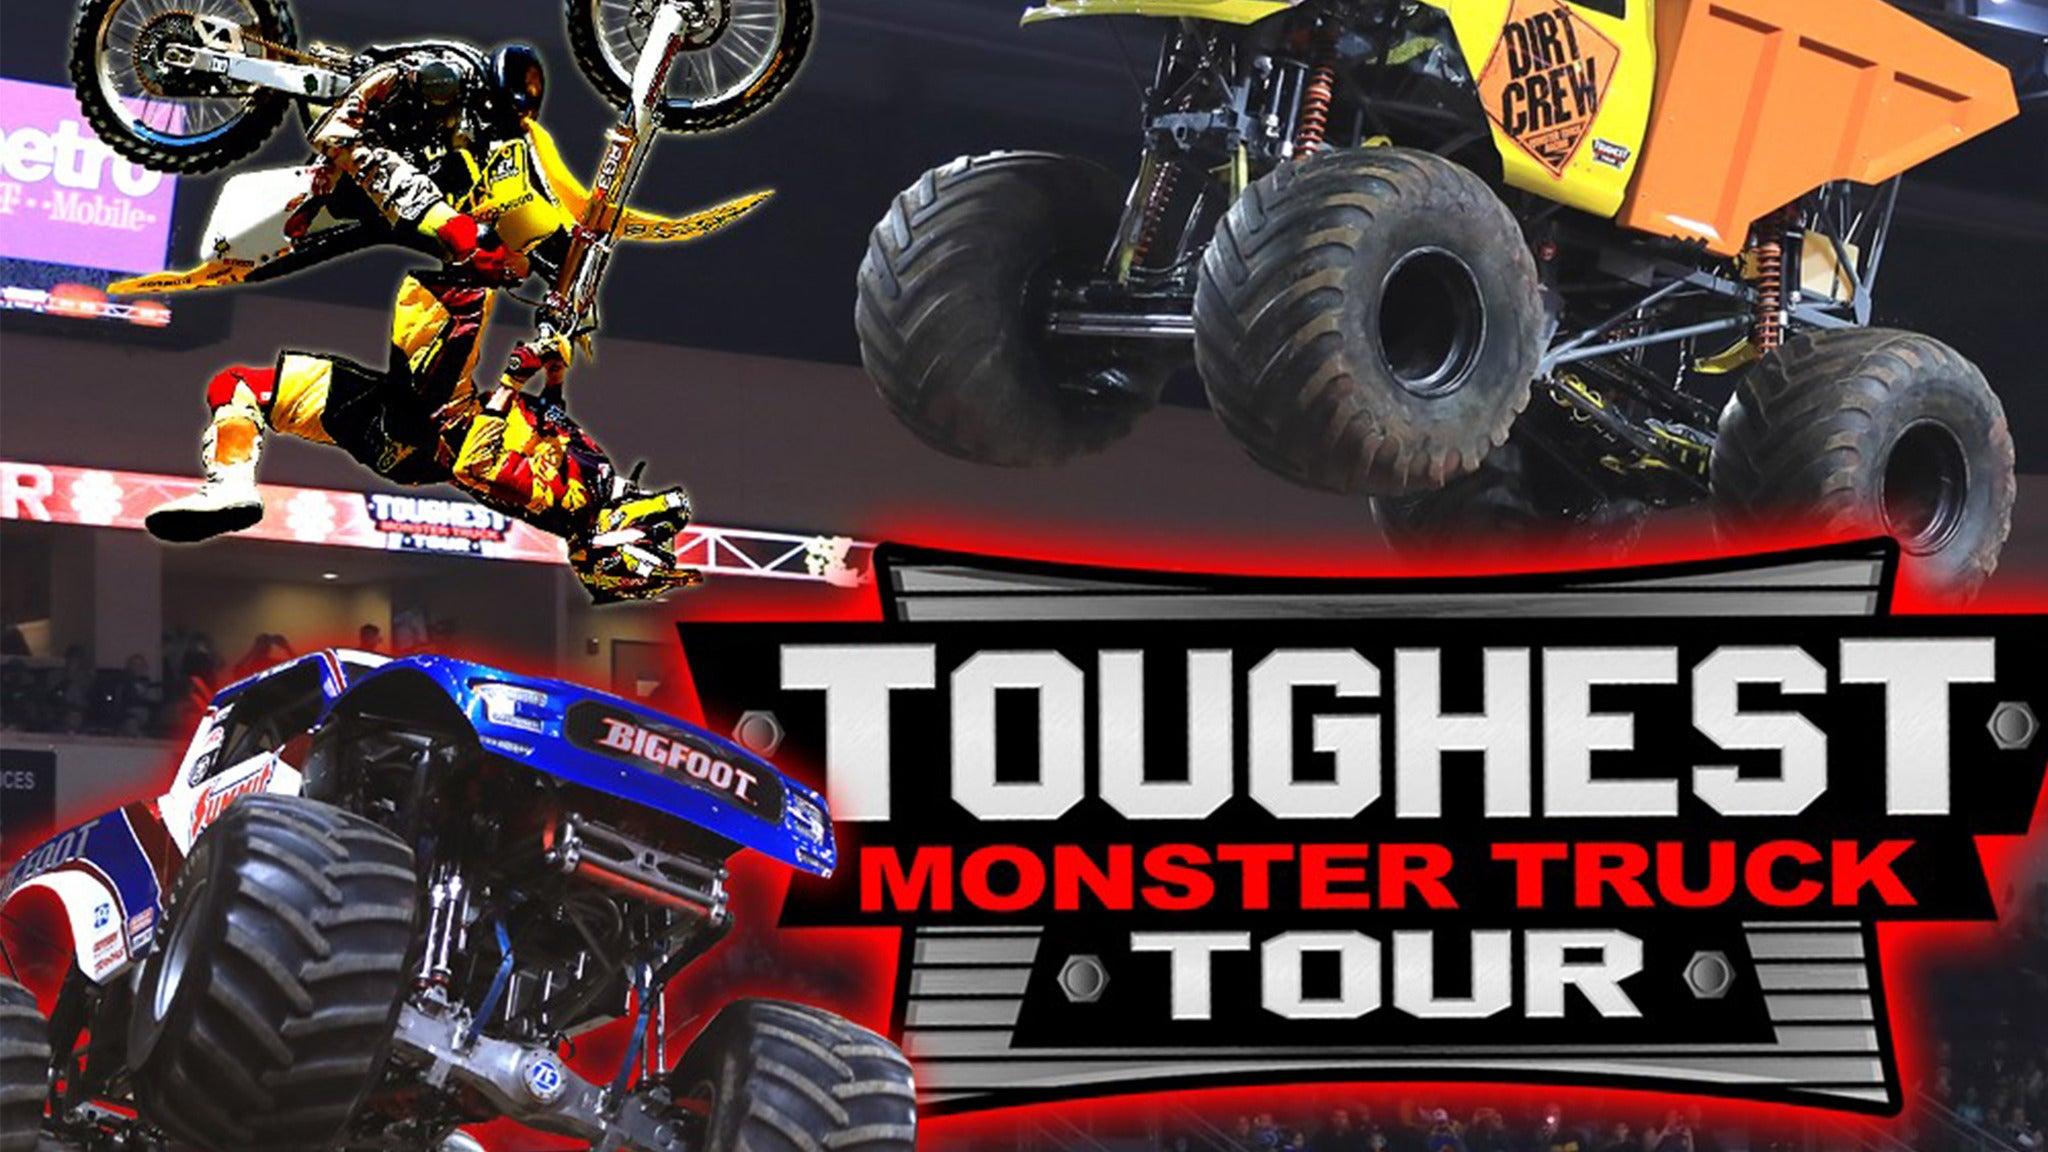 Toughest Monster Truck Tour presale password for show tickets in Tulsa, OK (BOK Center)